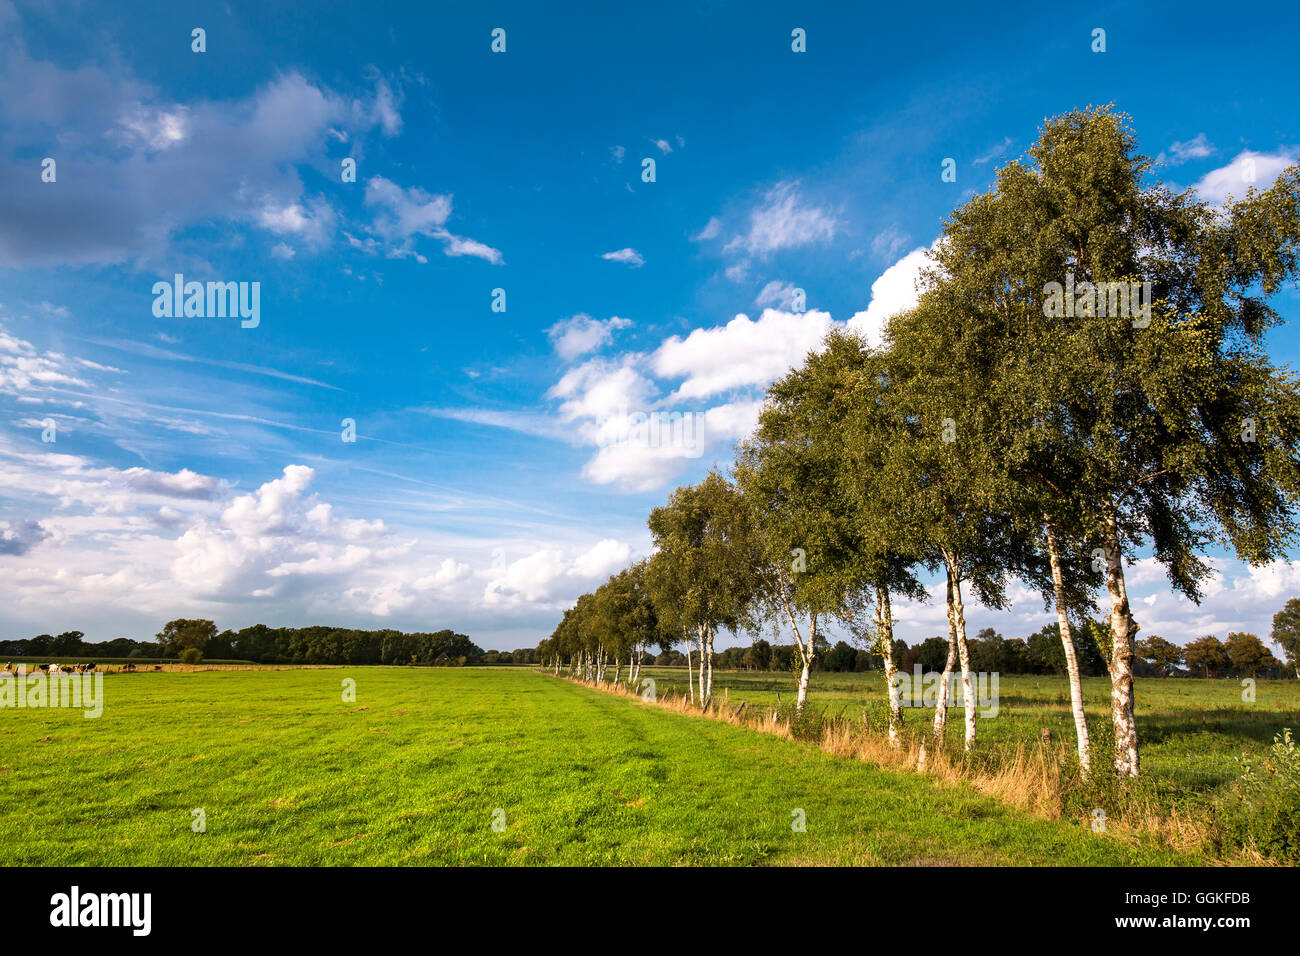 Birch alley, Worpswede, Teufelsmoor, Lower Saxony, Germany - Stock Image